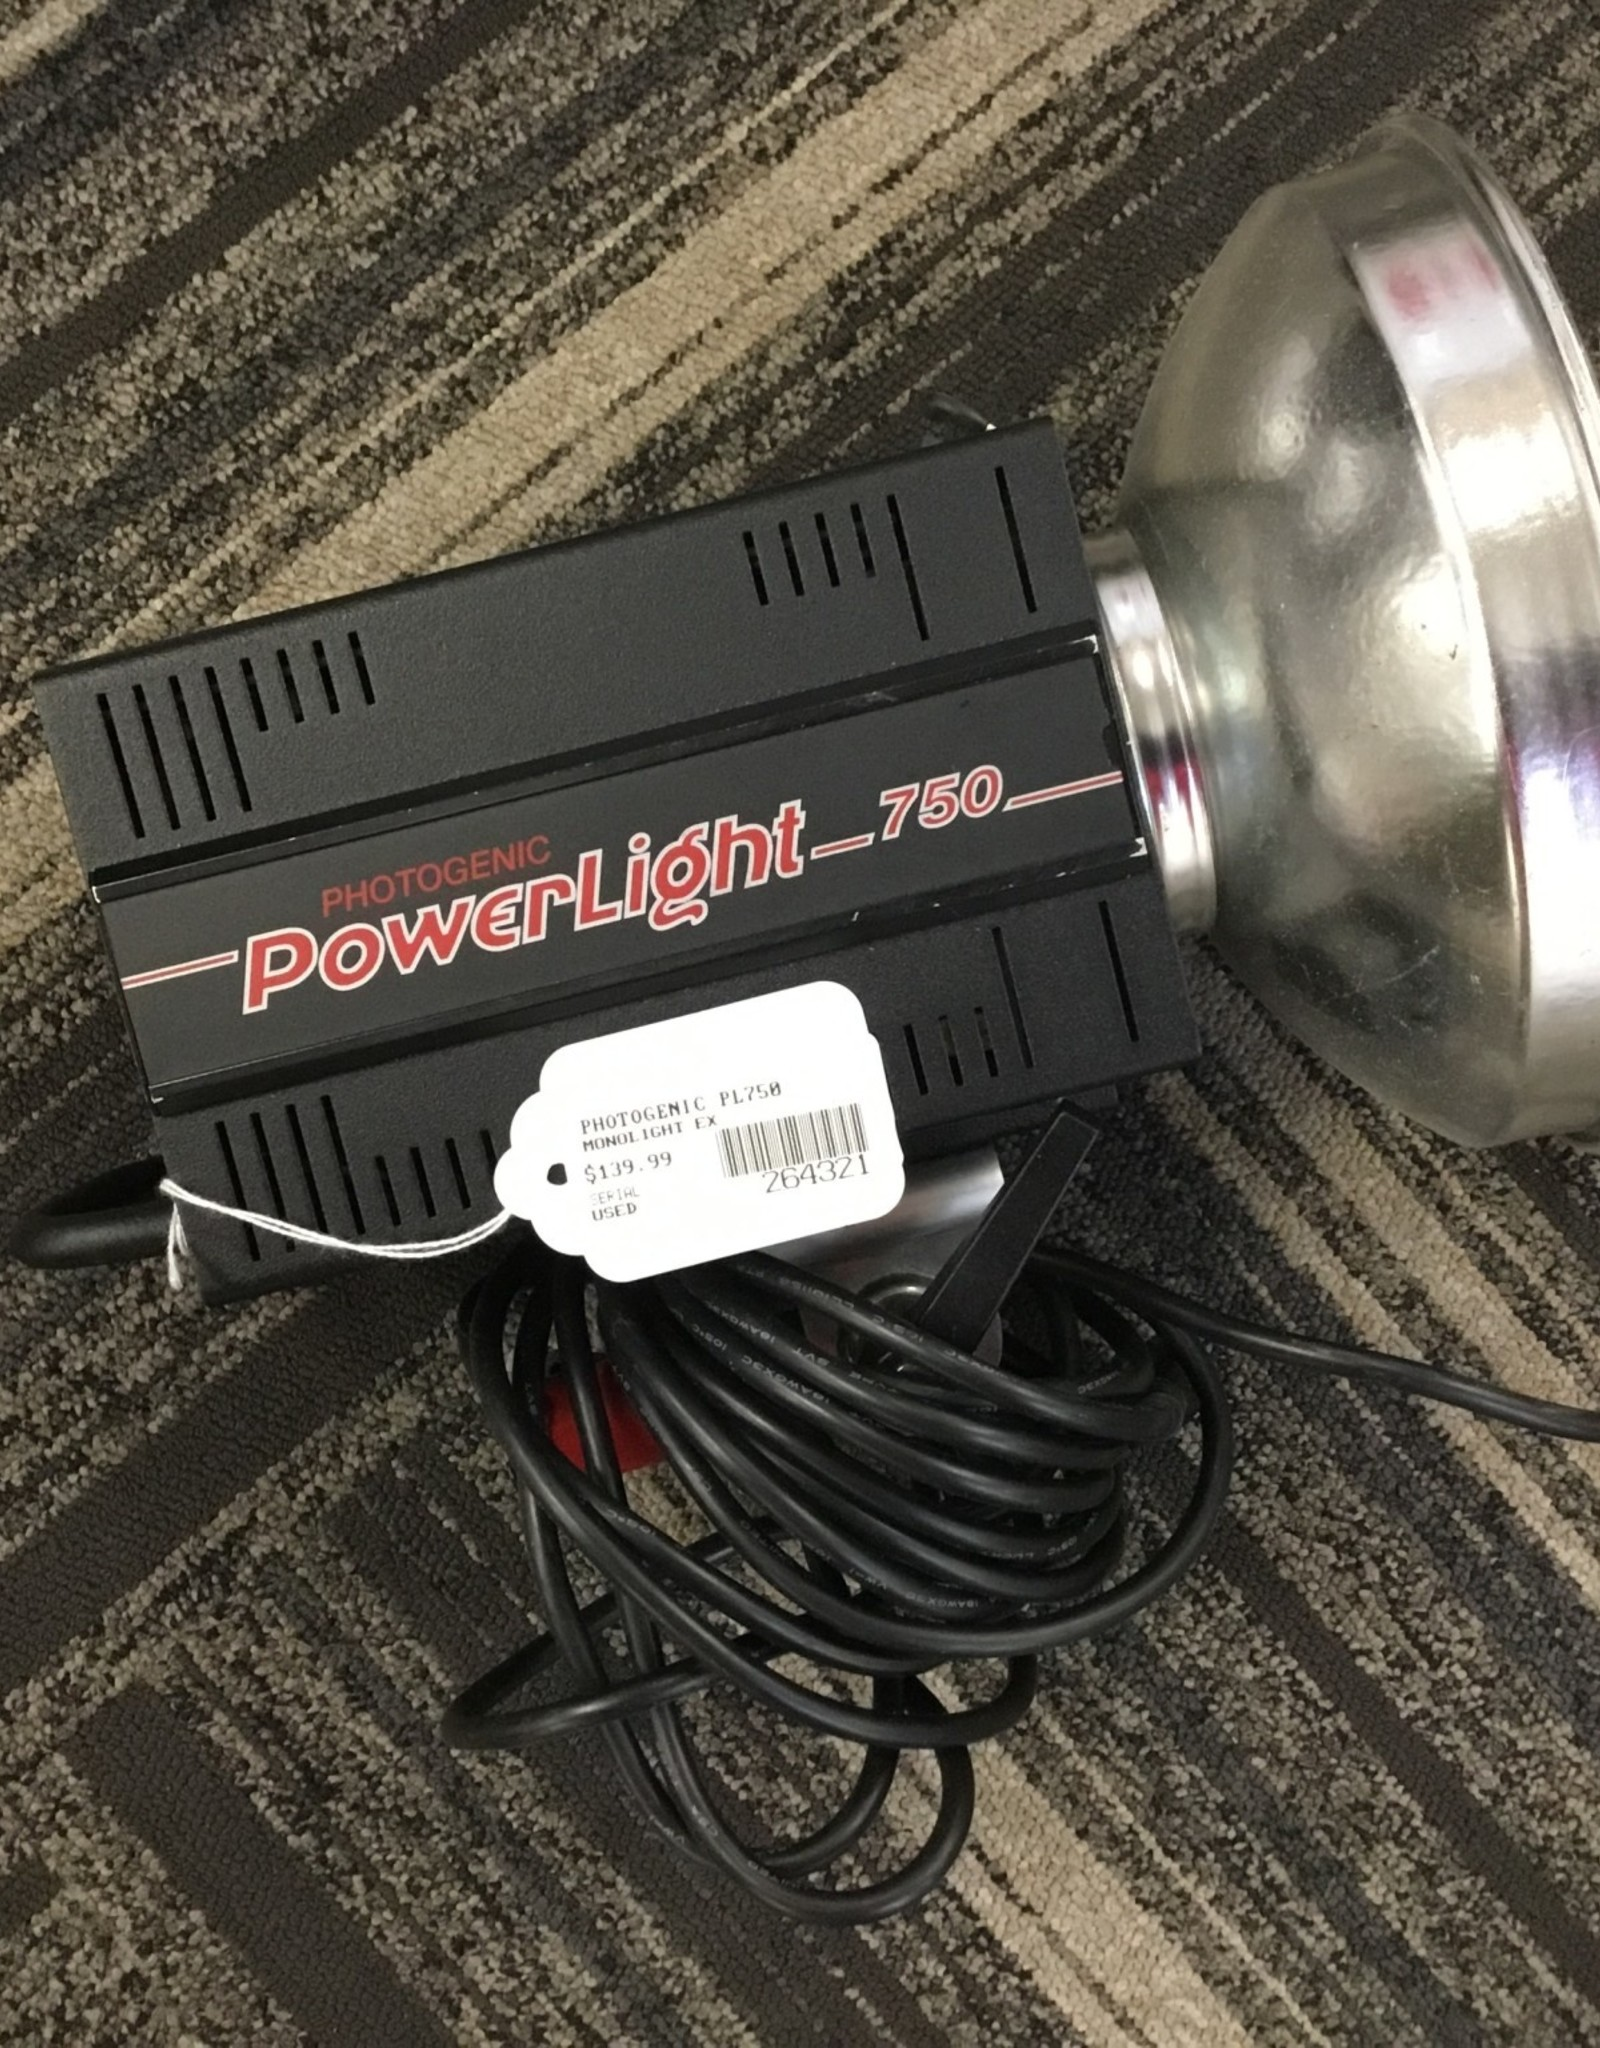 Photogenic PL750 monolight used